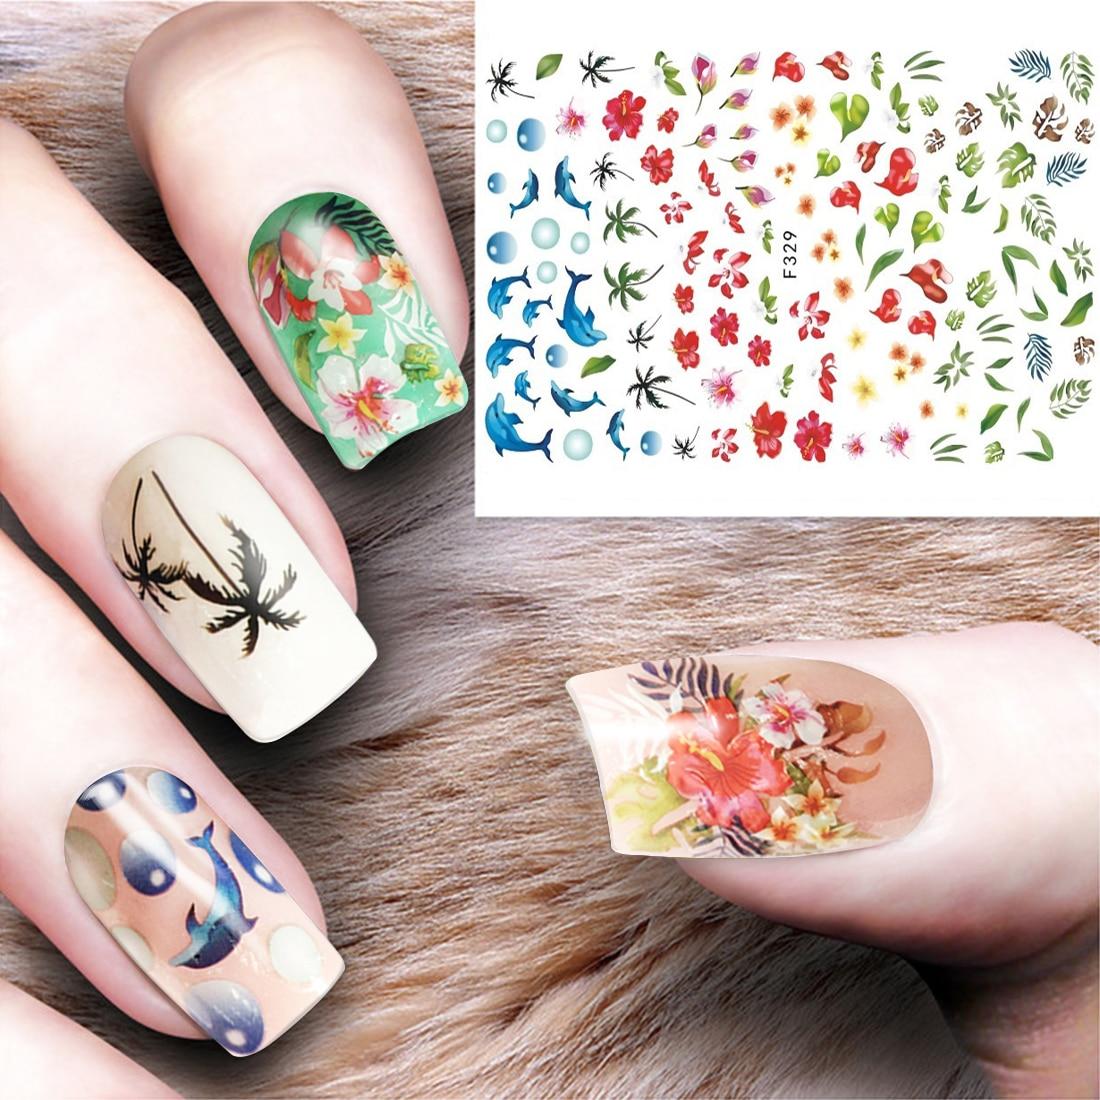 Hot 3d Flower Nail Art Stickers Pretty Cherry Blossom Diy Adesivo De